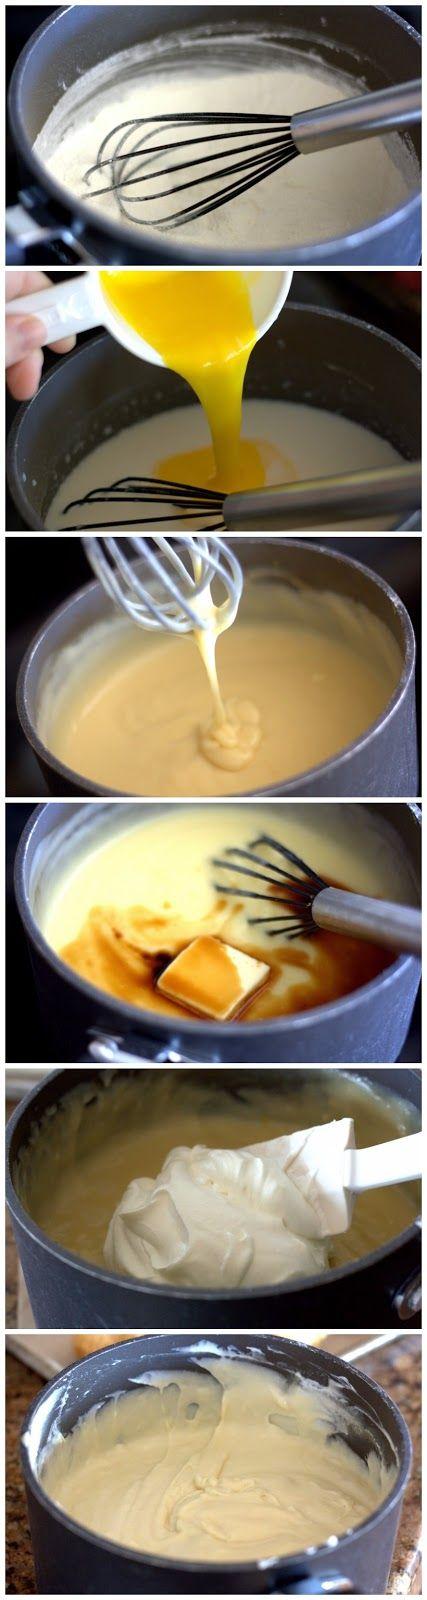 Easy Bavarian Cream Recipe  Ingredients   1 cup sugar  ¾ cup all purpose flour  ¾ tsp. fine sea salt  3 cups milk  3 egg yolks  2 tbs but...